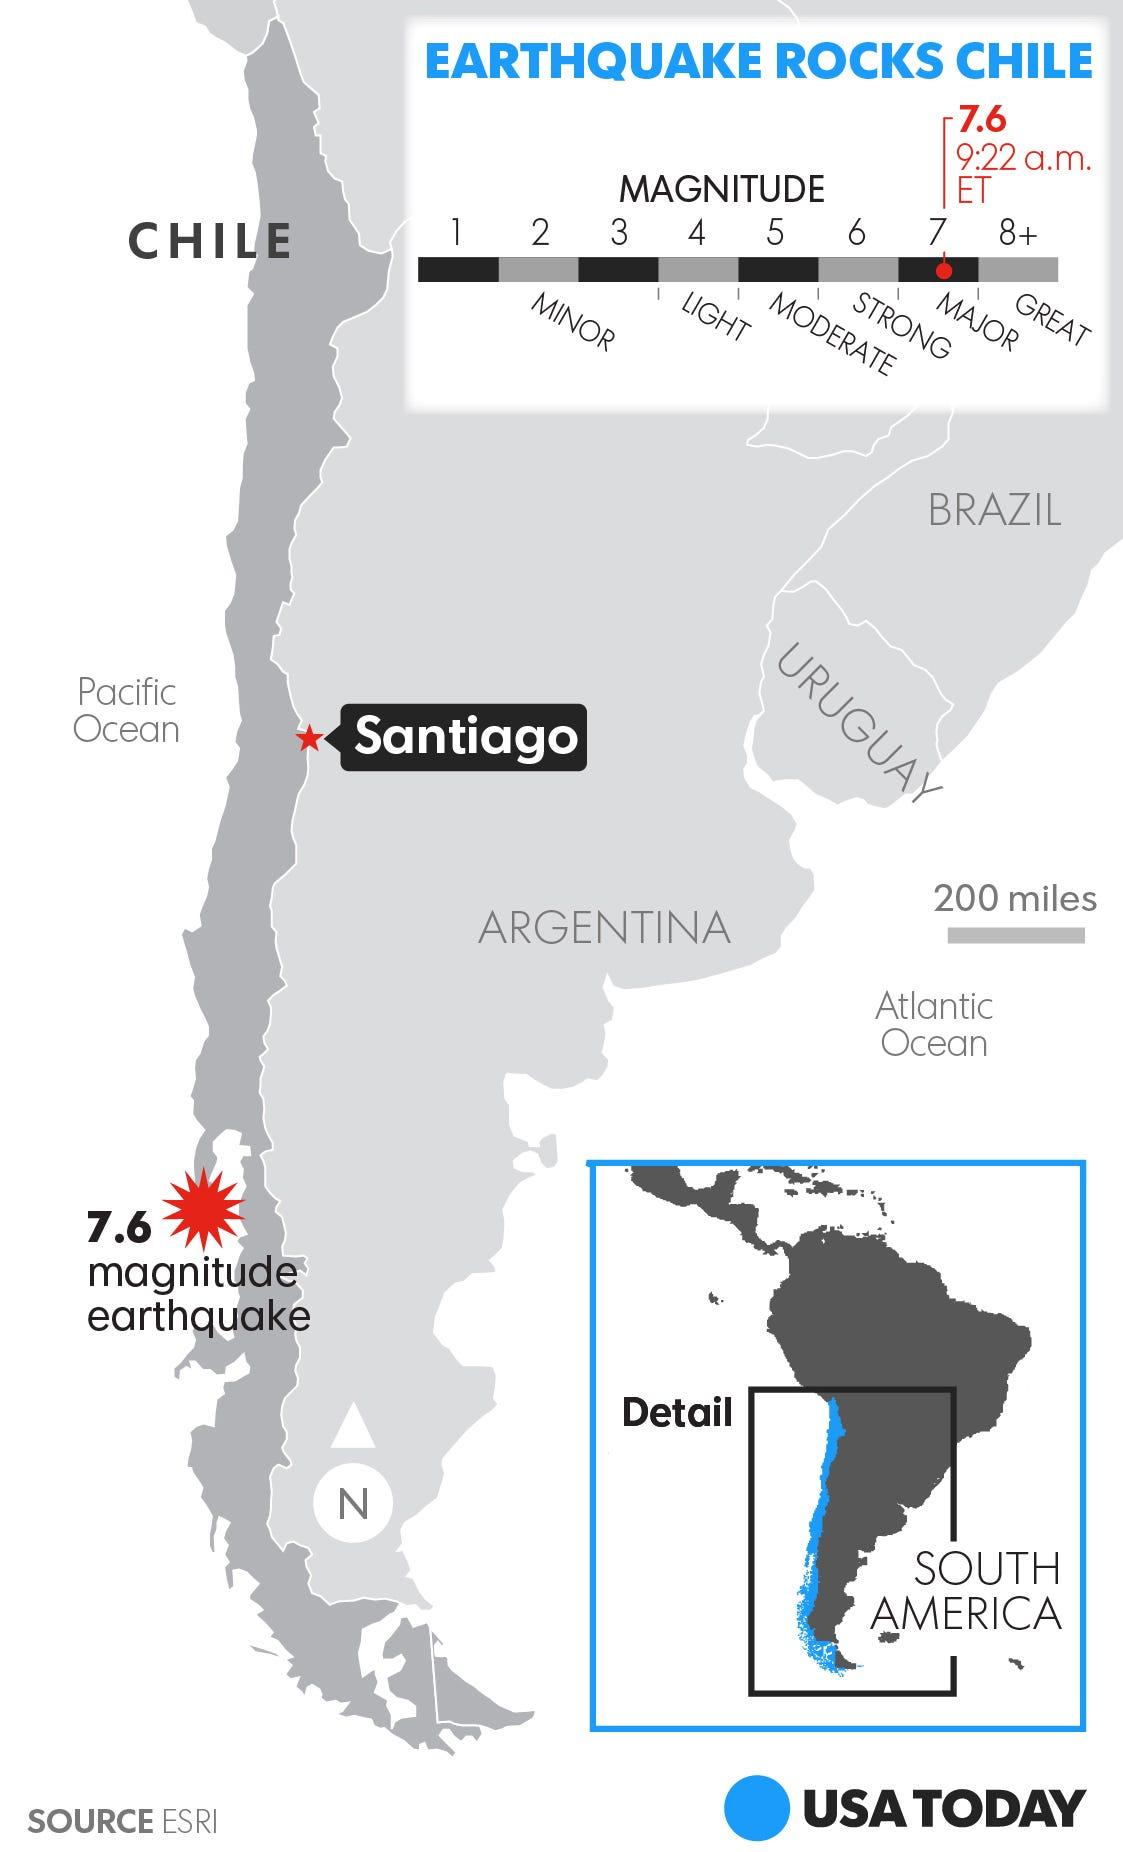 Powerful earthquake shakes Chile